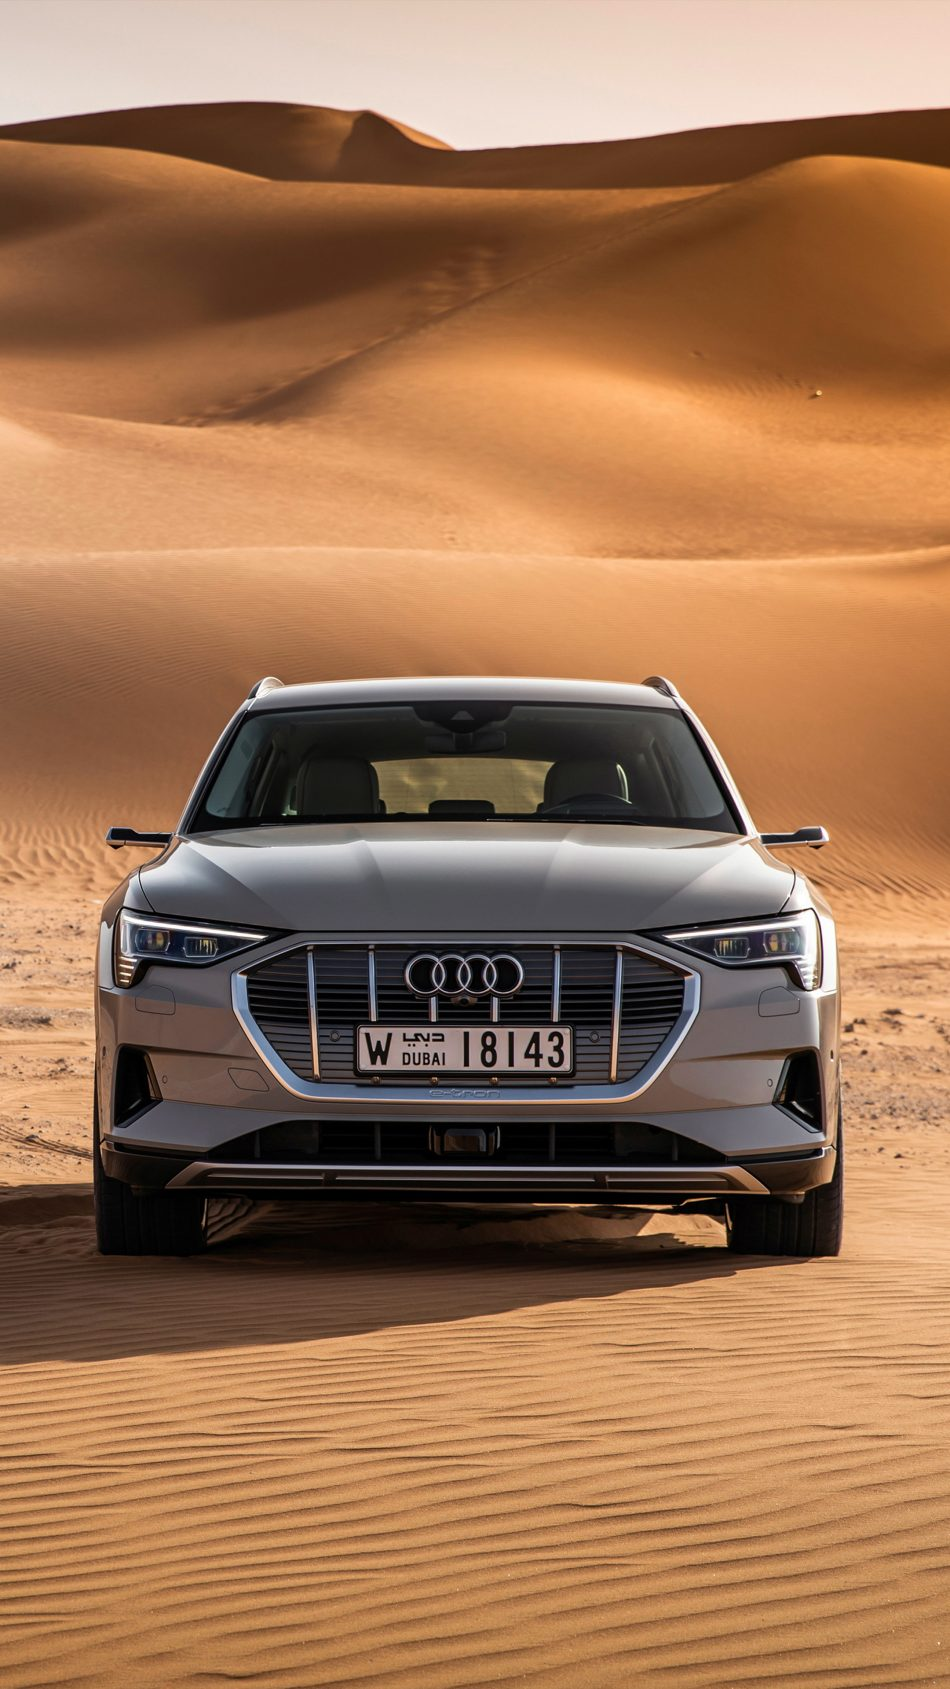 Audi E Tron 55 Quattro Dubai Desert 4K Ultra HD Mobile Wallpaper